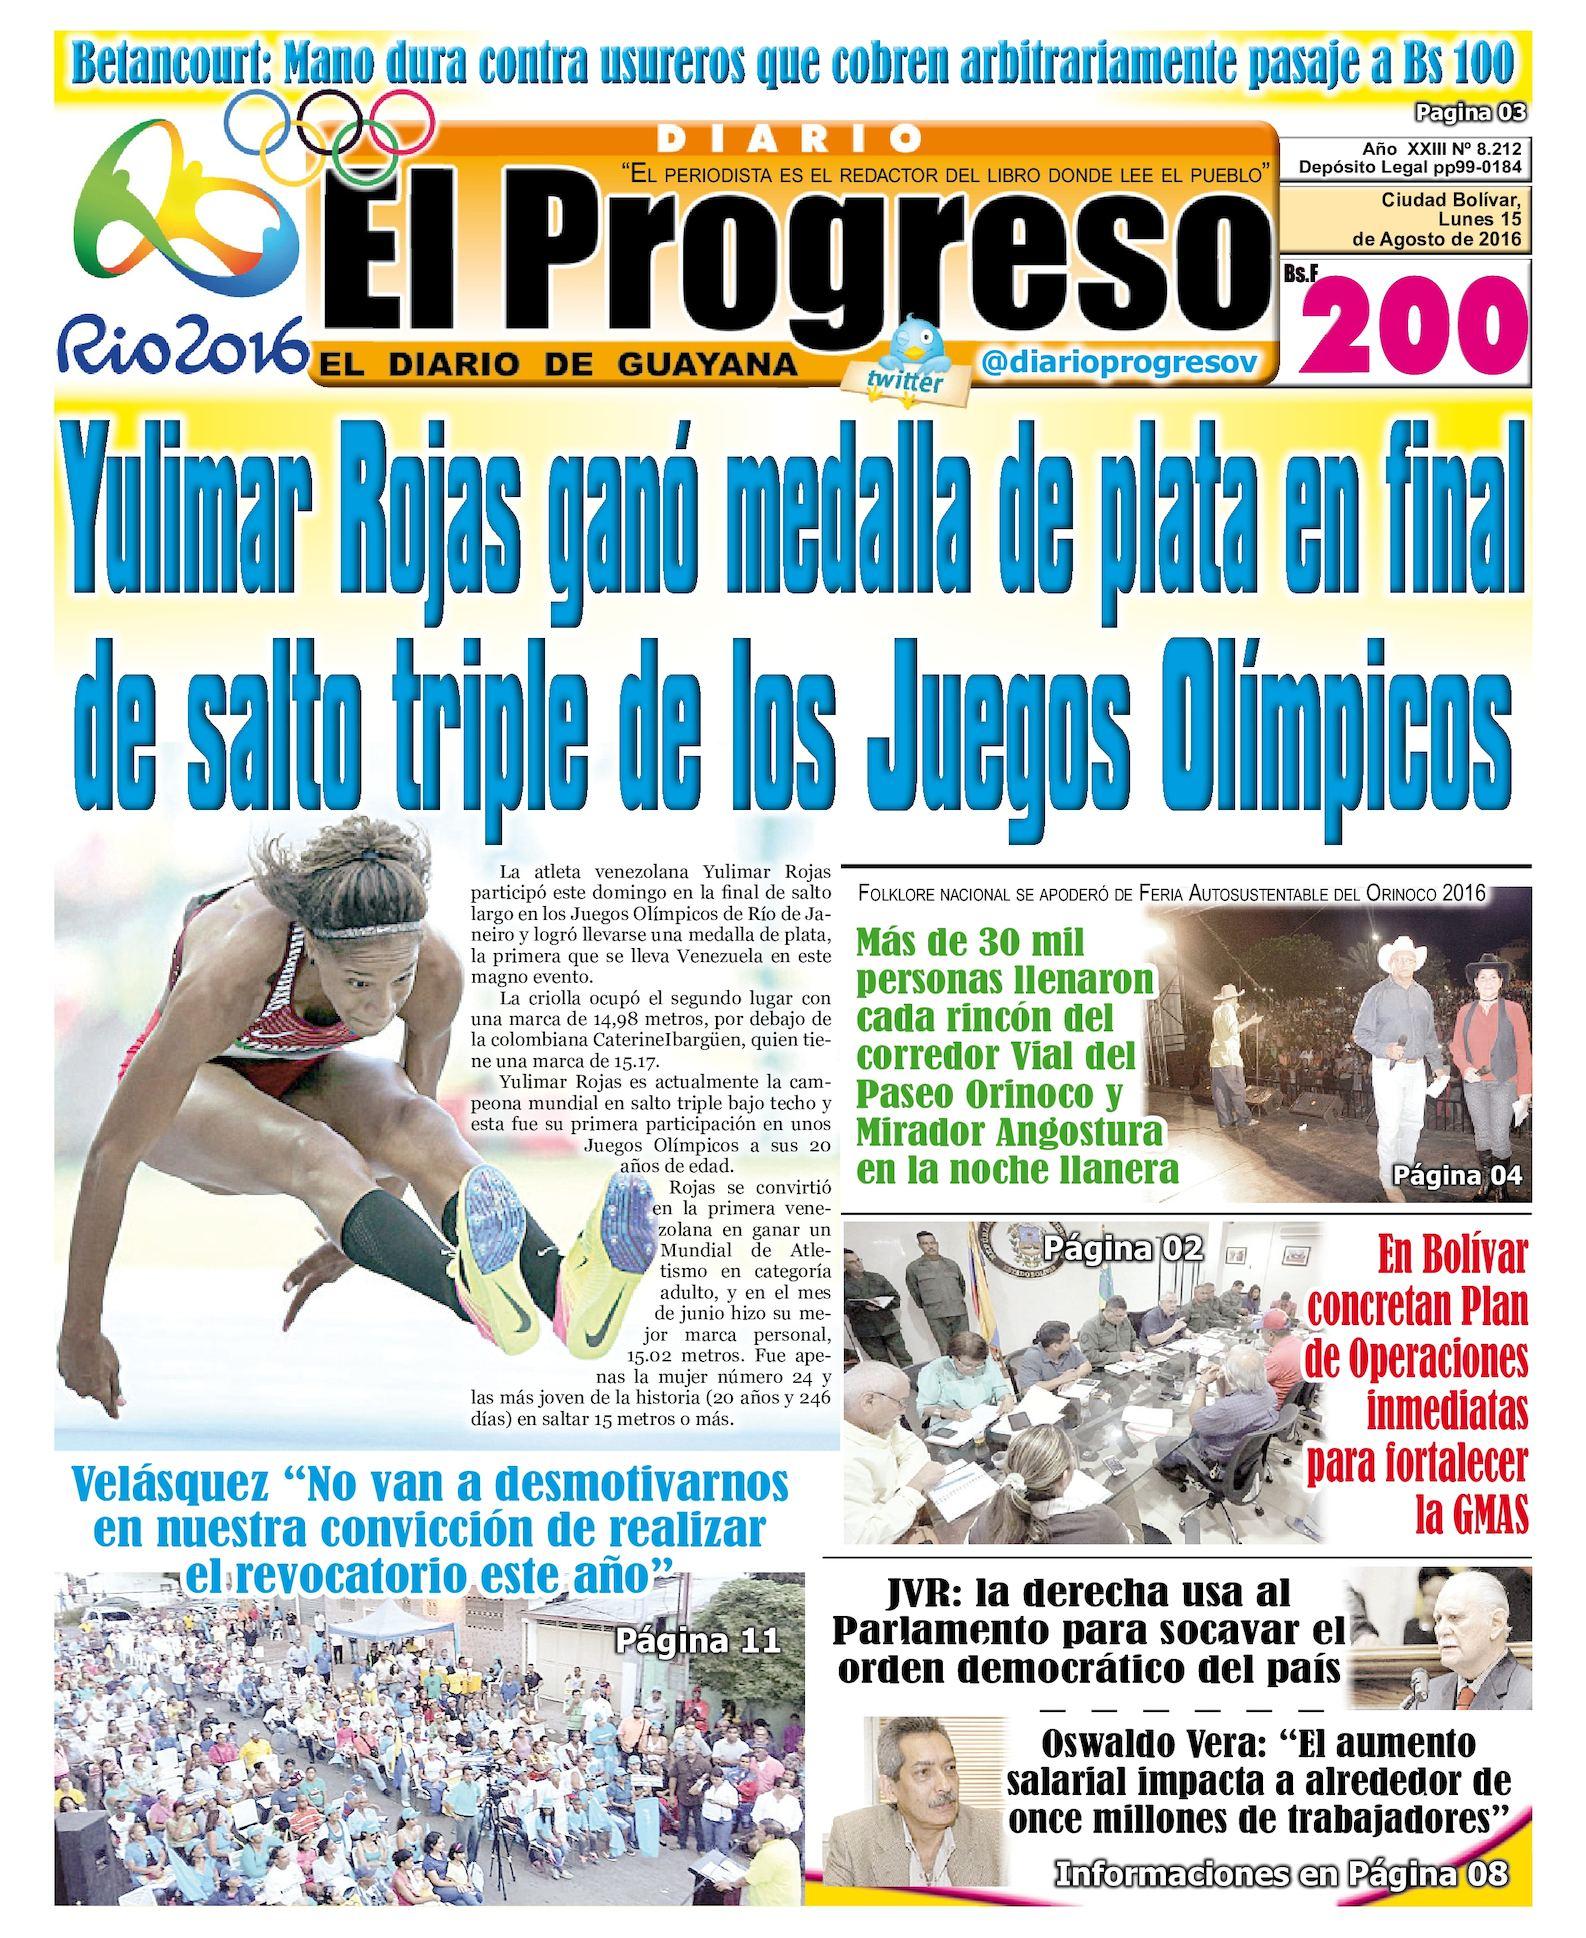 d4f0fa573 Calaméo - Diarioelprogreso2016 08 15